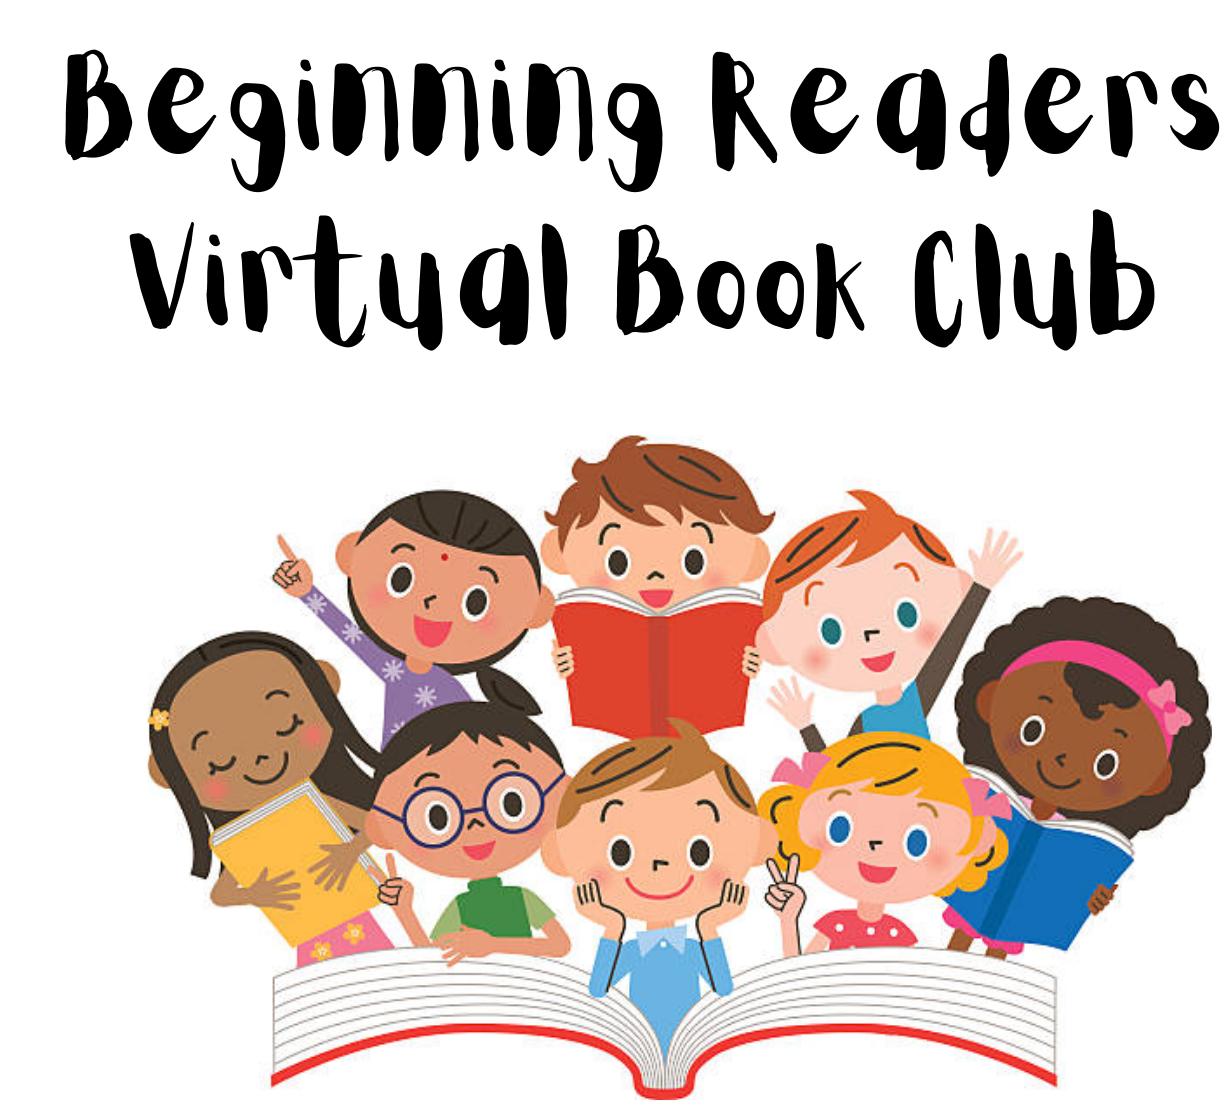 Beginning Readers Book Club - Norbert's Big Dream